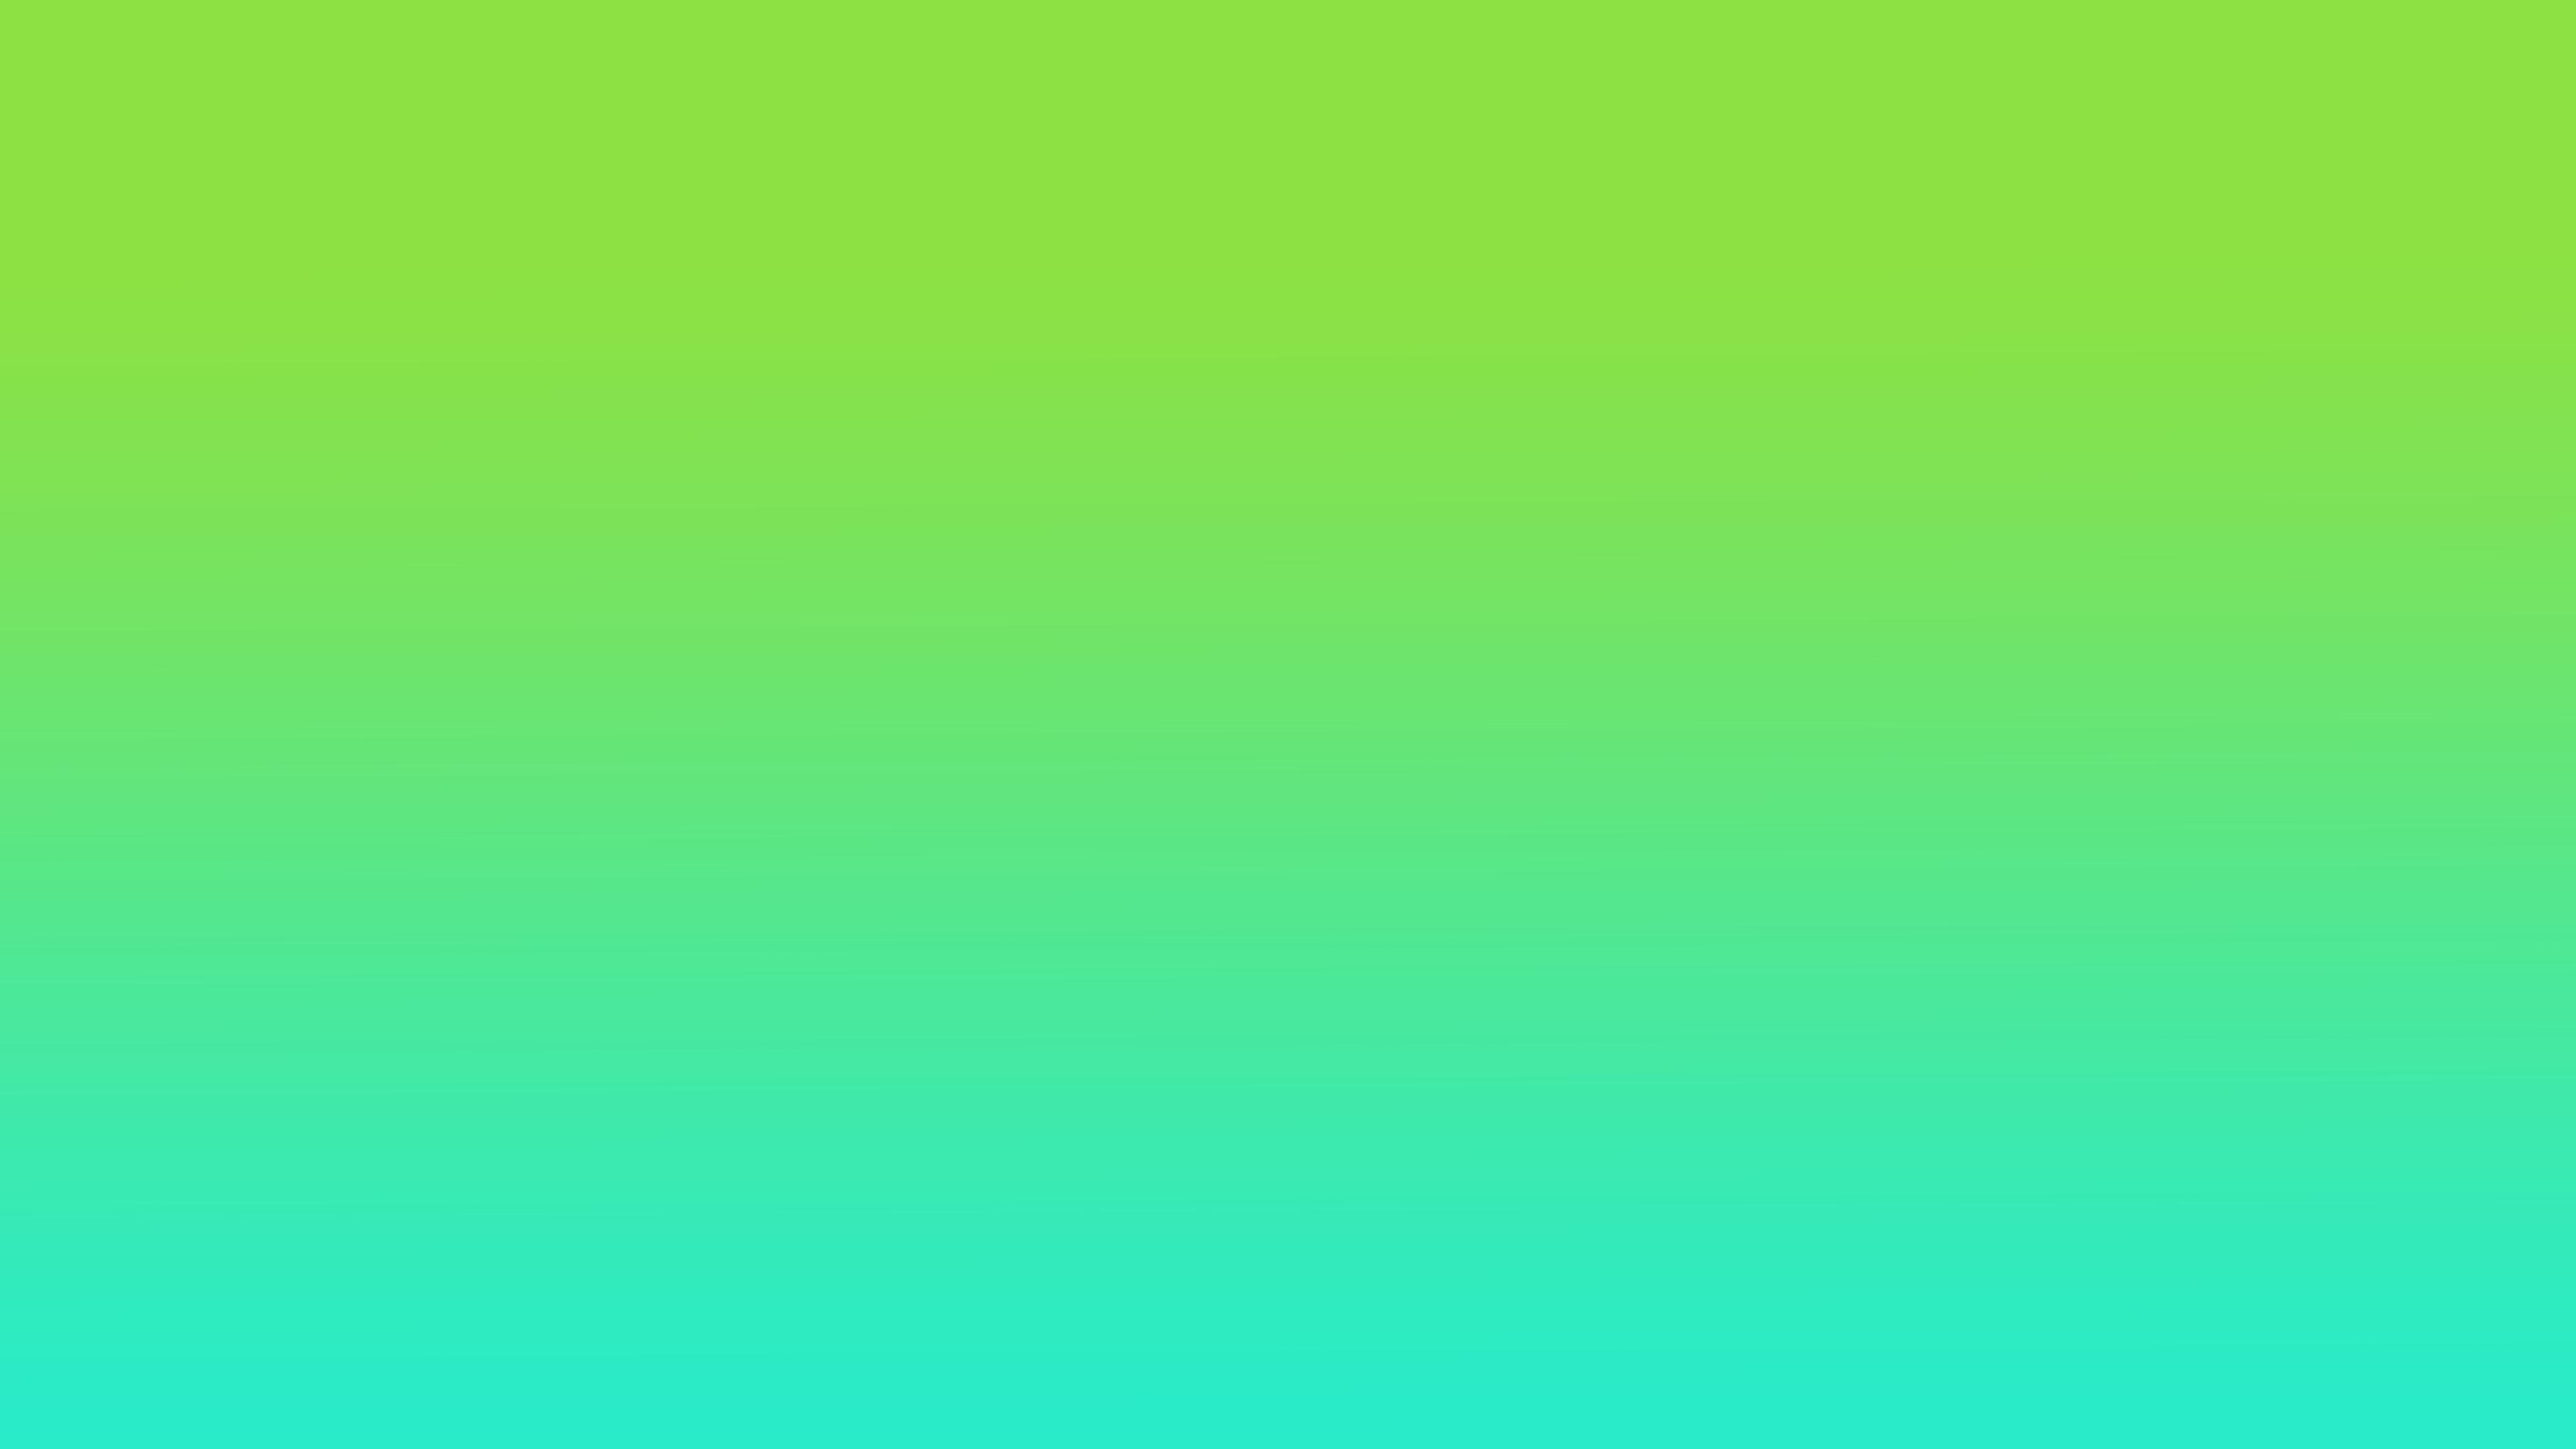 Fond D Ecran Gradient Doux Pente Couleur Unie 3840x2160 Hanako 1537851 Fond D Ecran Wallhere